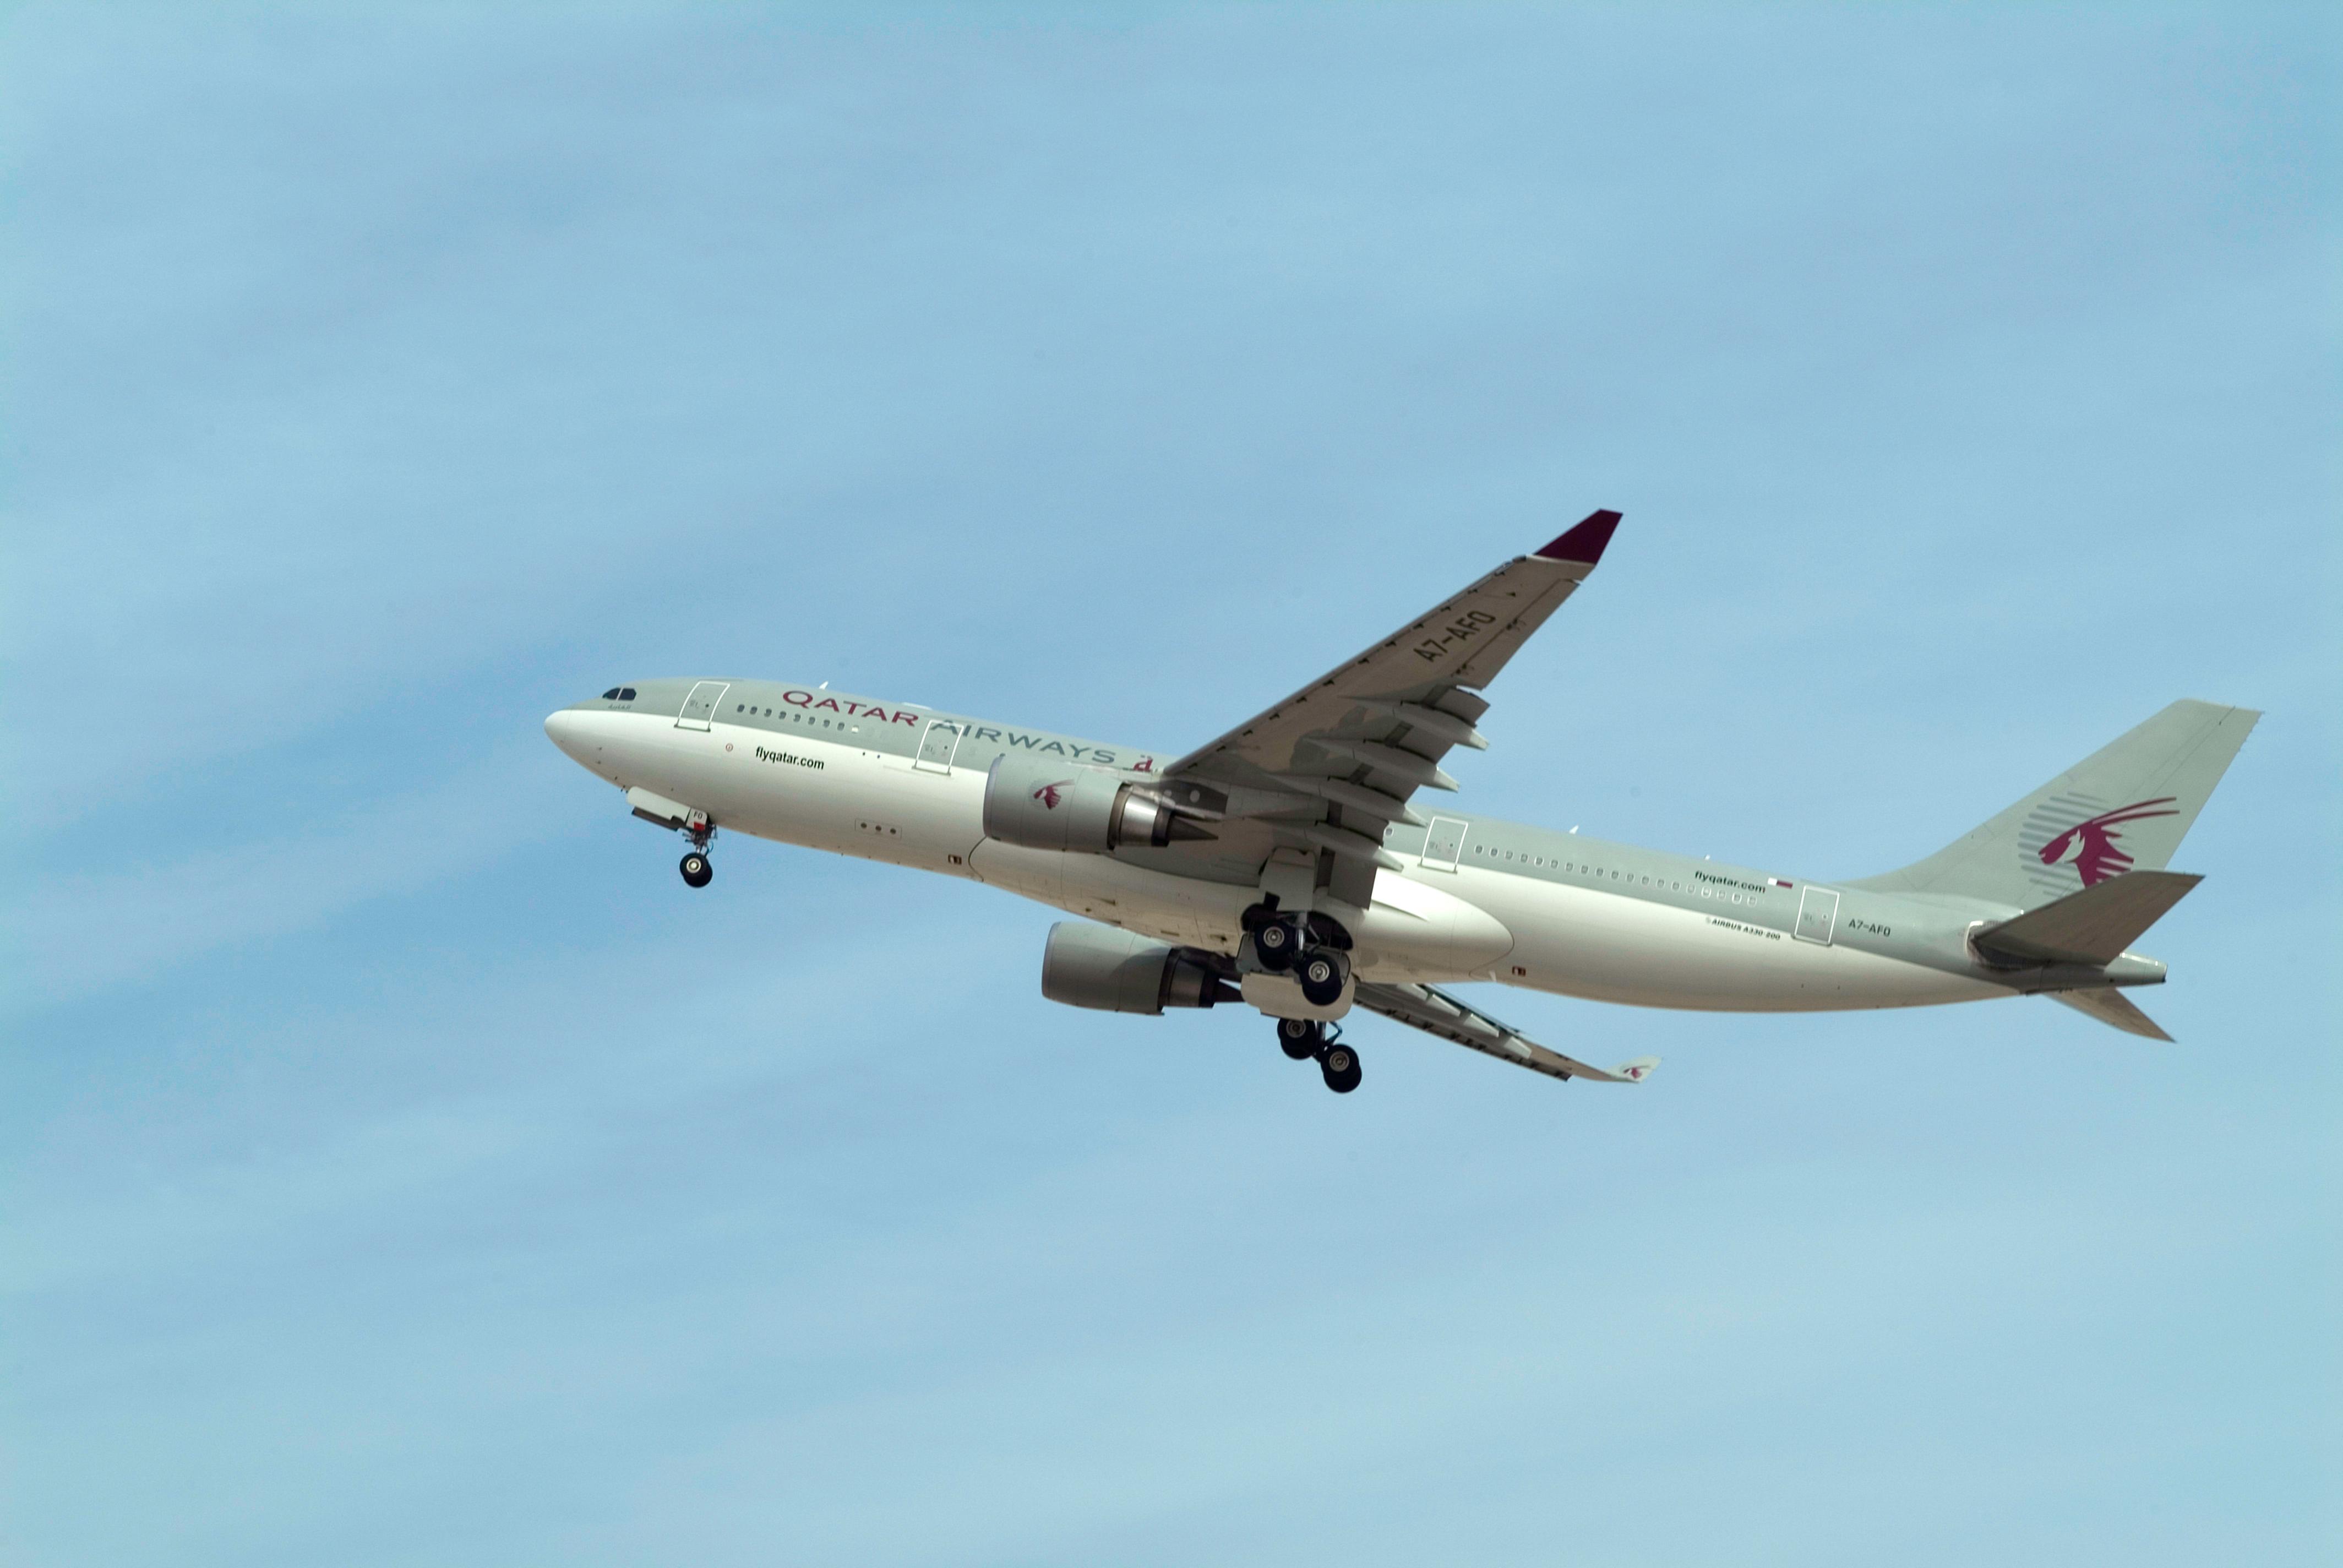 Qatar Airways aircraft takes off, Doha, Qatar.